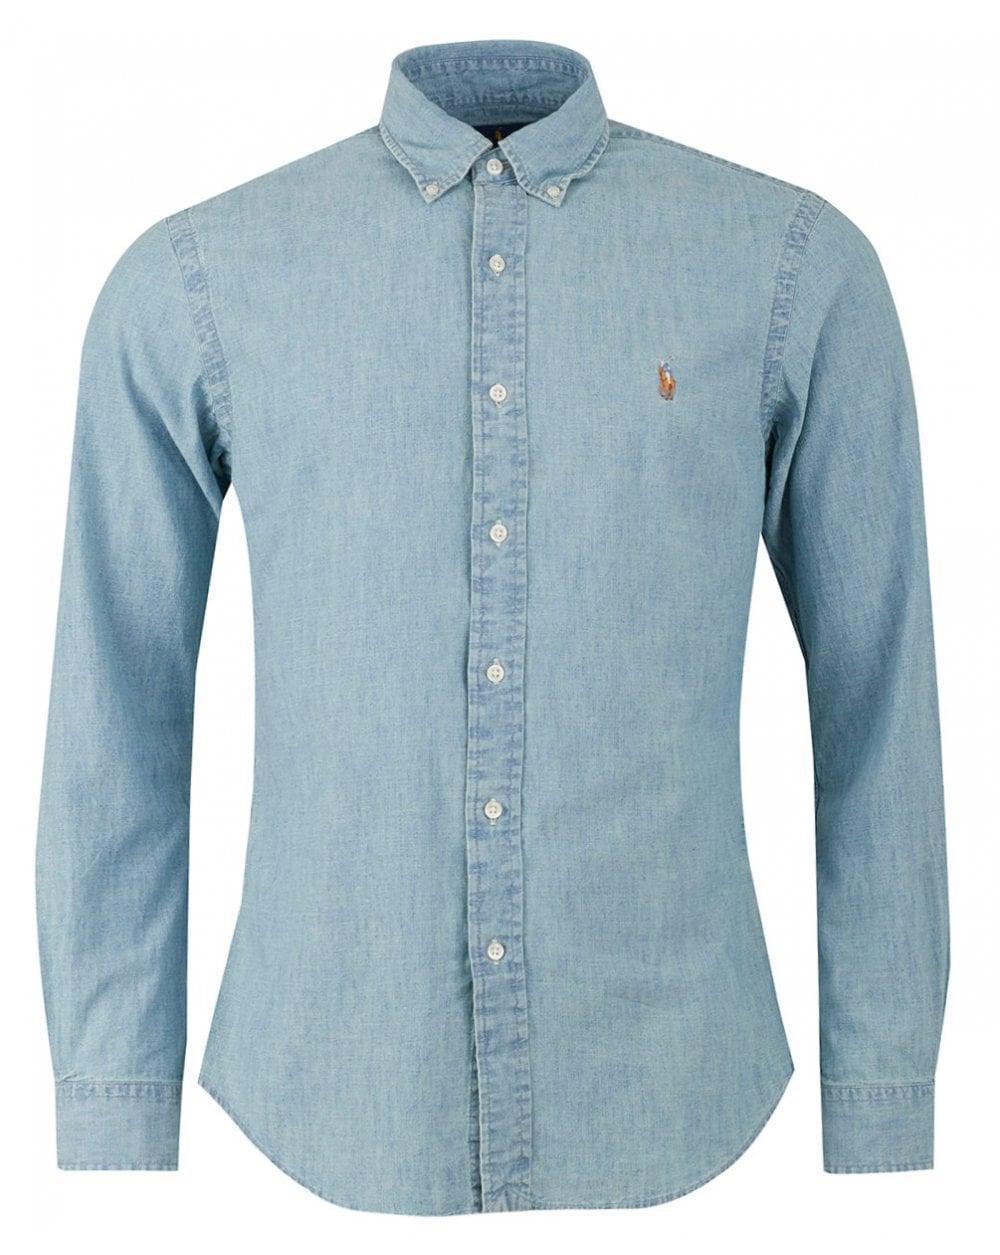 e3471c80c8ca Polo Ralph Lauren Slim Fit Light Chambray Shirt in Blue for Men ...